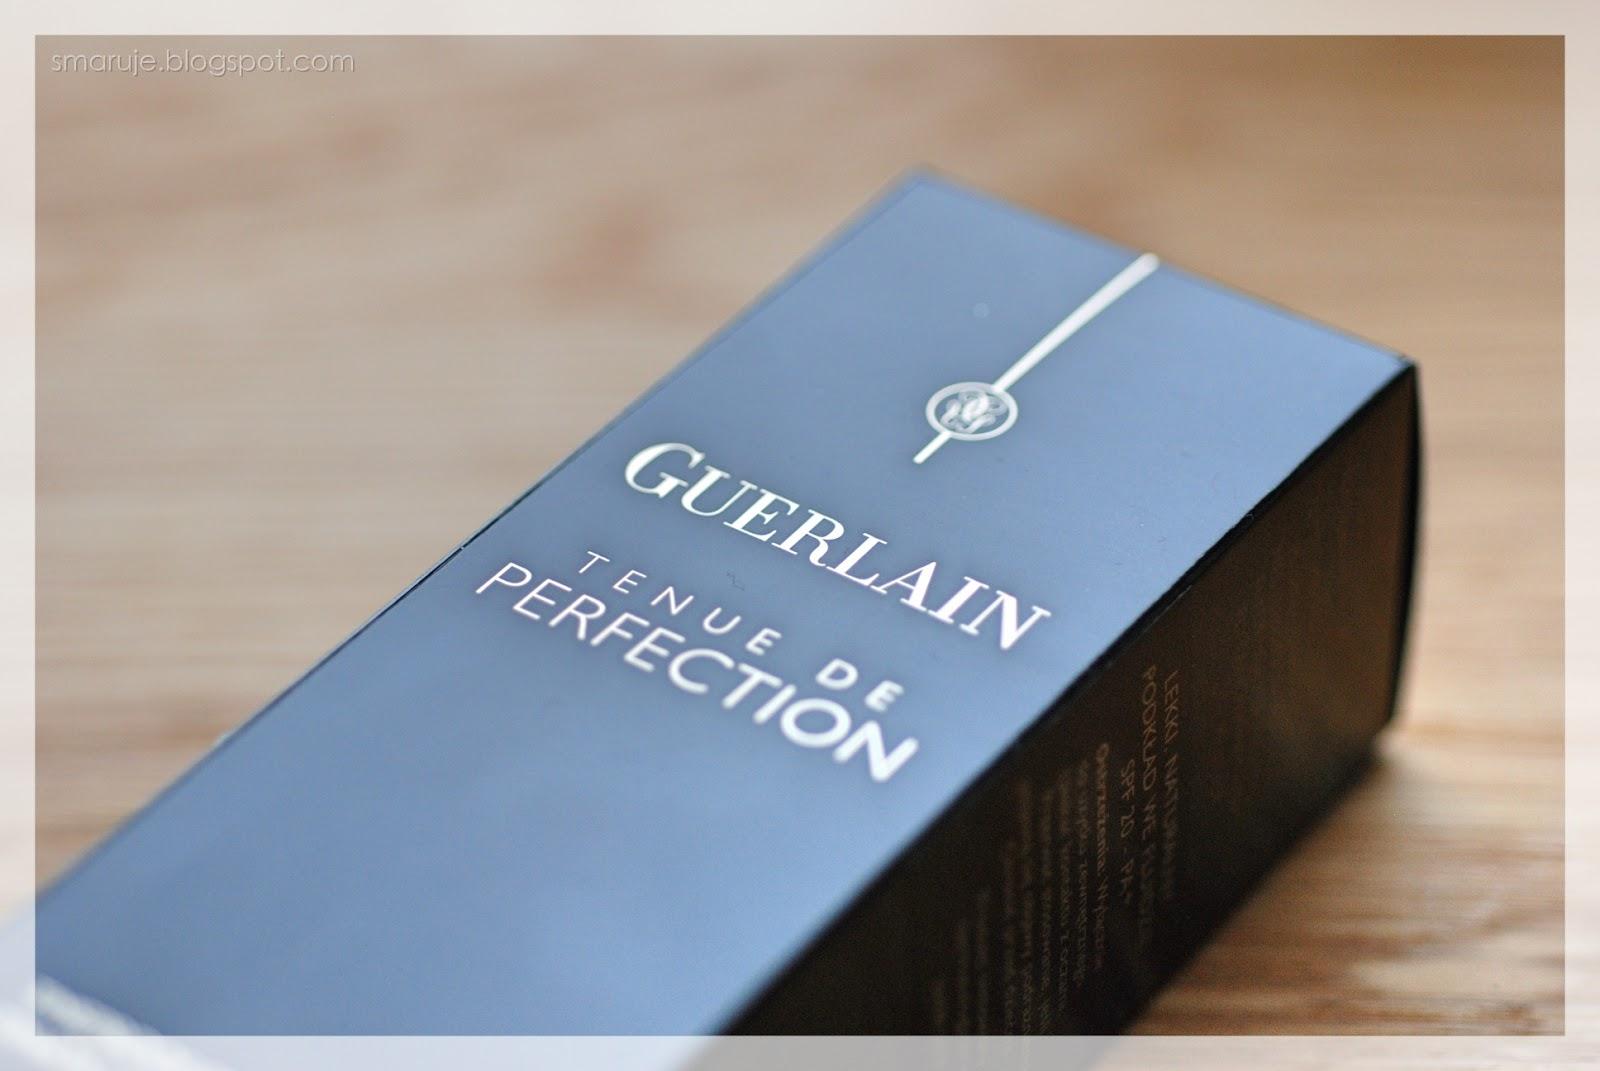 Mój ulubiony nie-ideał: Guerlain – Tenue de Perfection /recenzja/